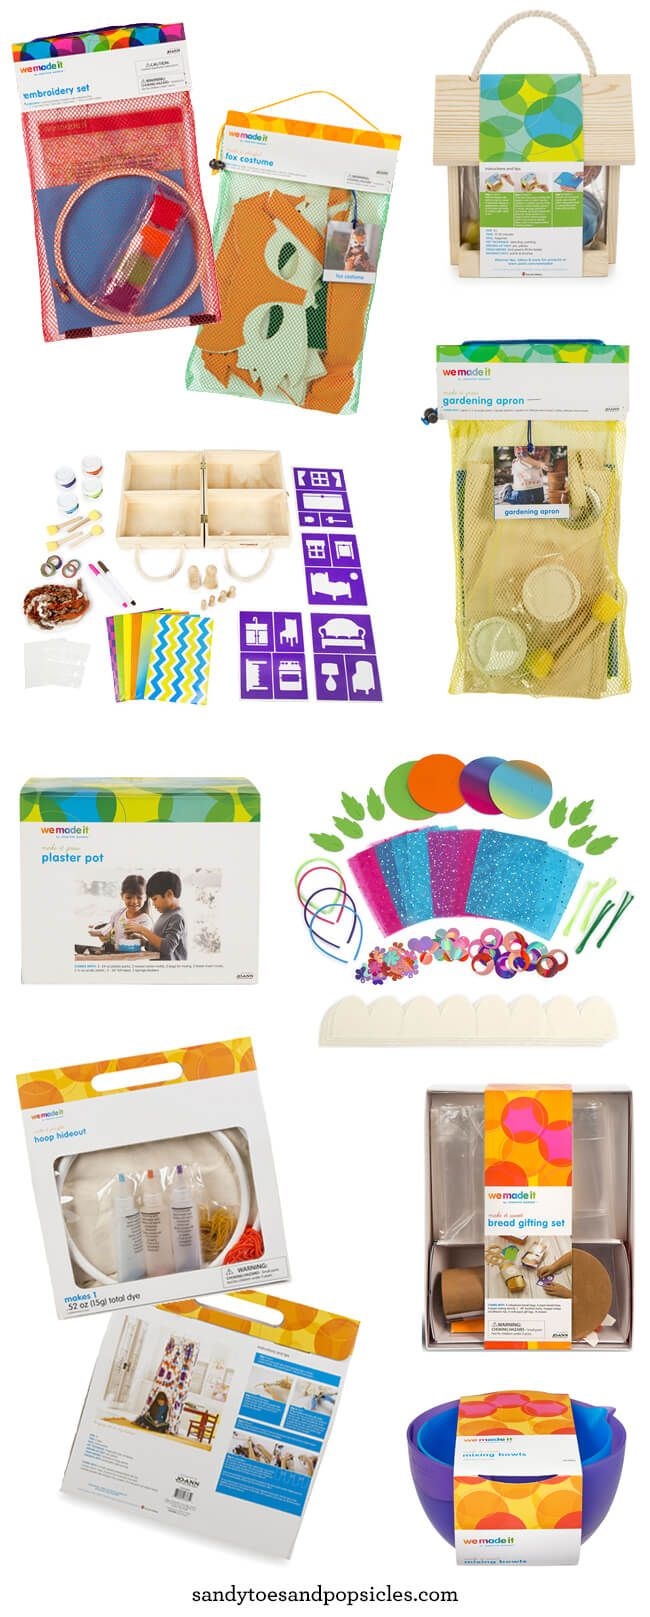 Craft kits for preschoolers - We Made It Craft Kits For Kids By Jennifer Garner At Joann Com And Jo